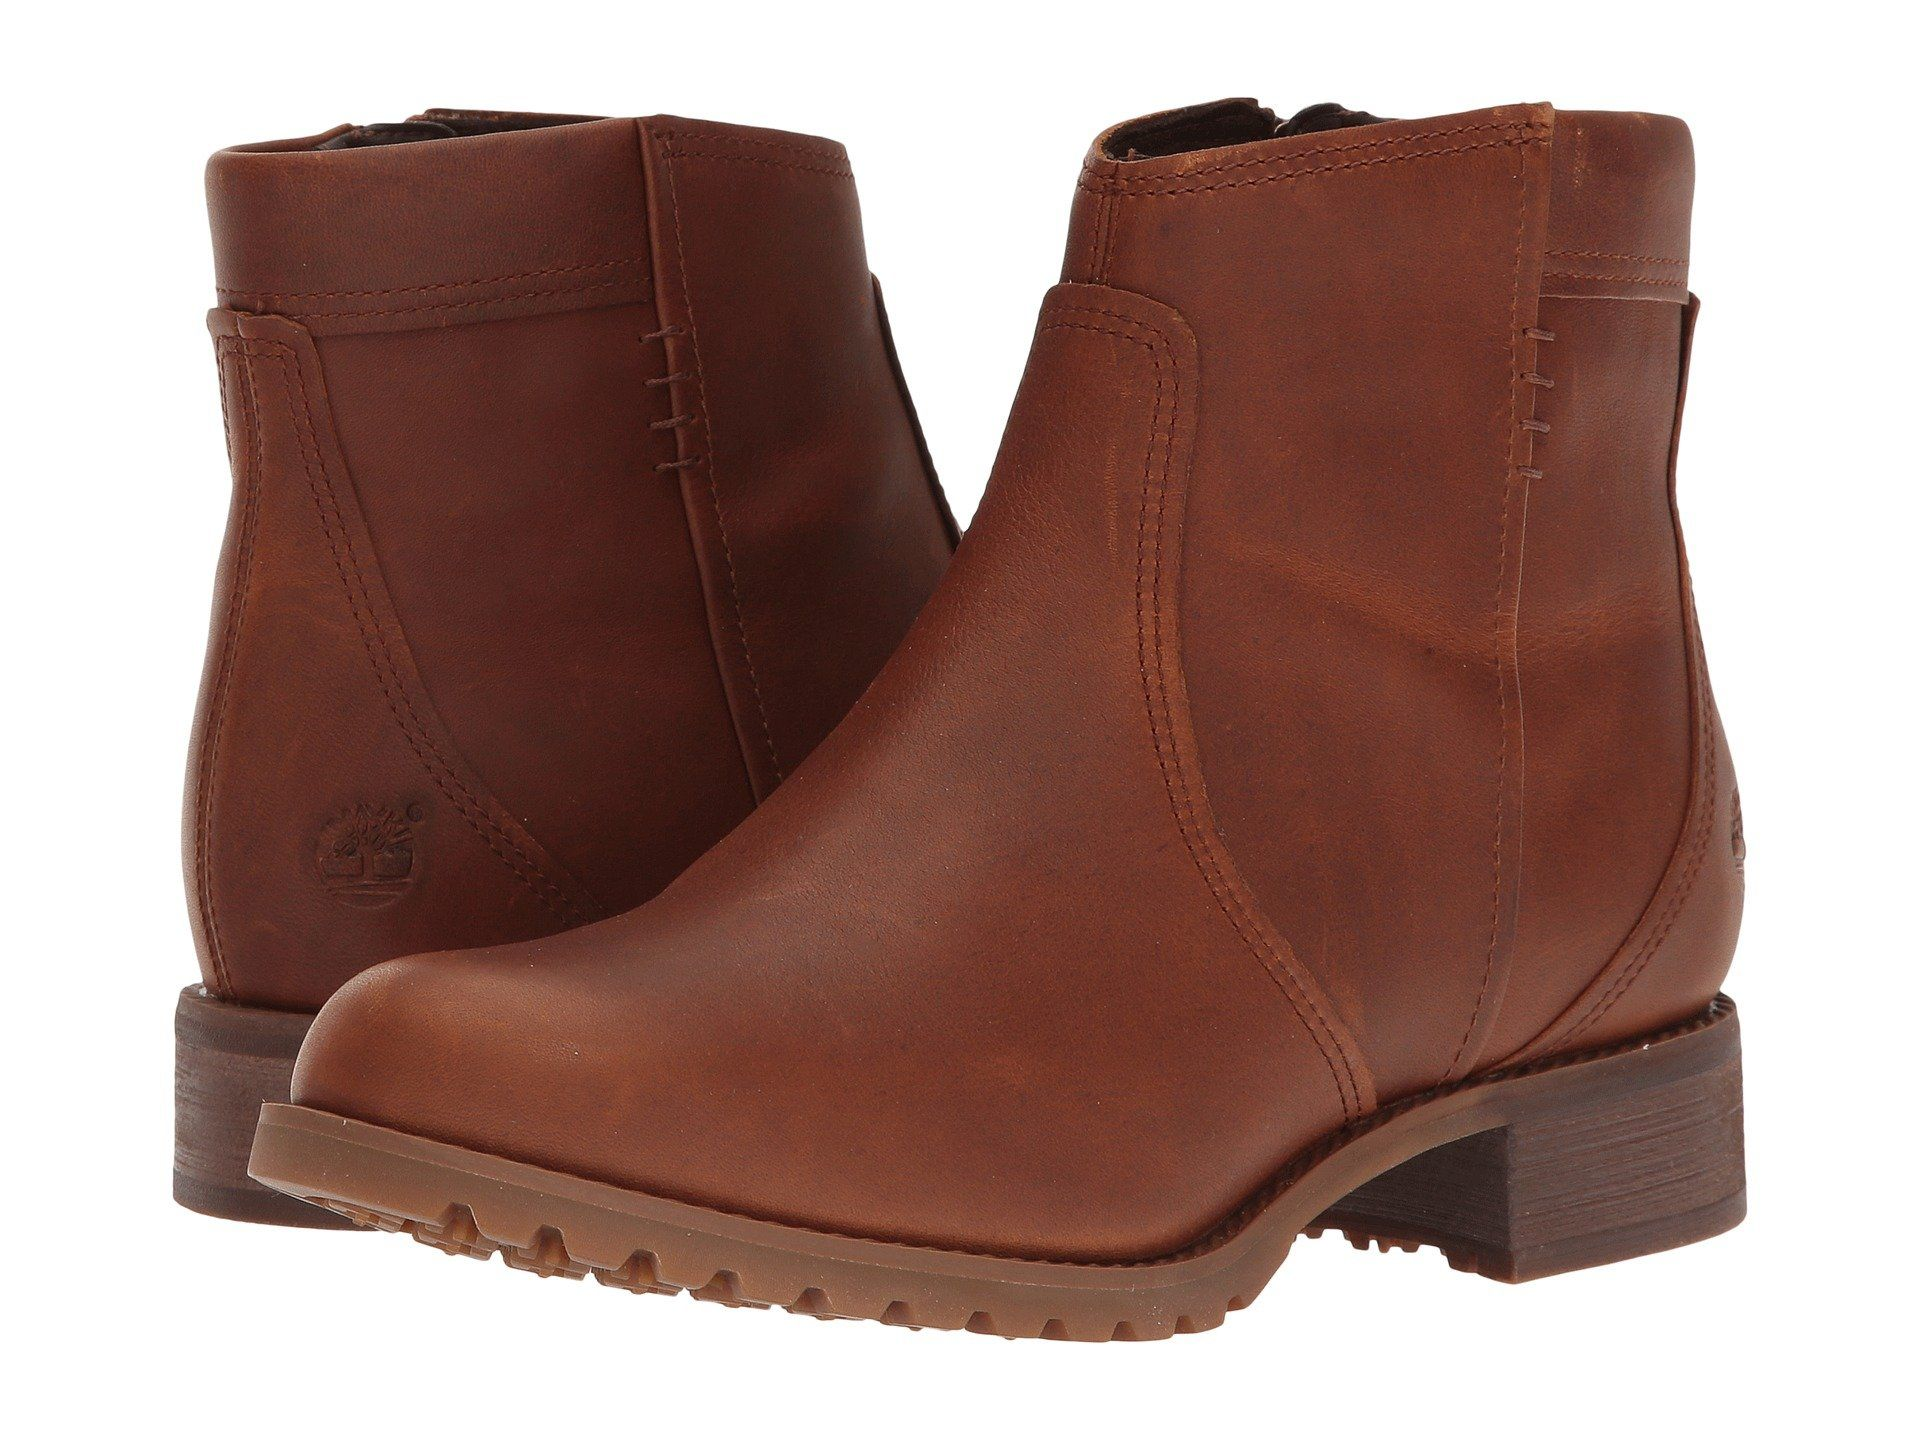 TIMBERLAND Banfield Side Zip Waterproof Ankle Boot